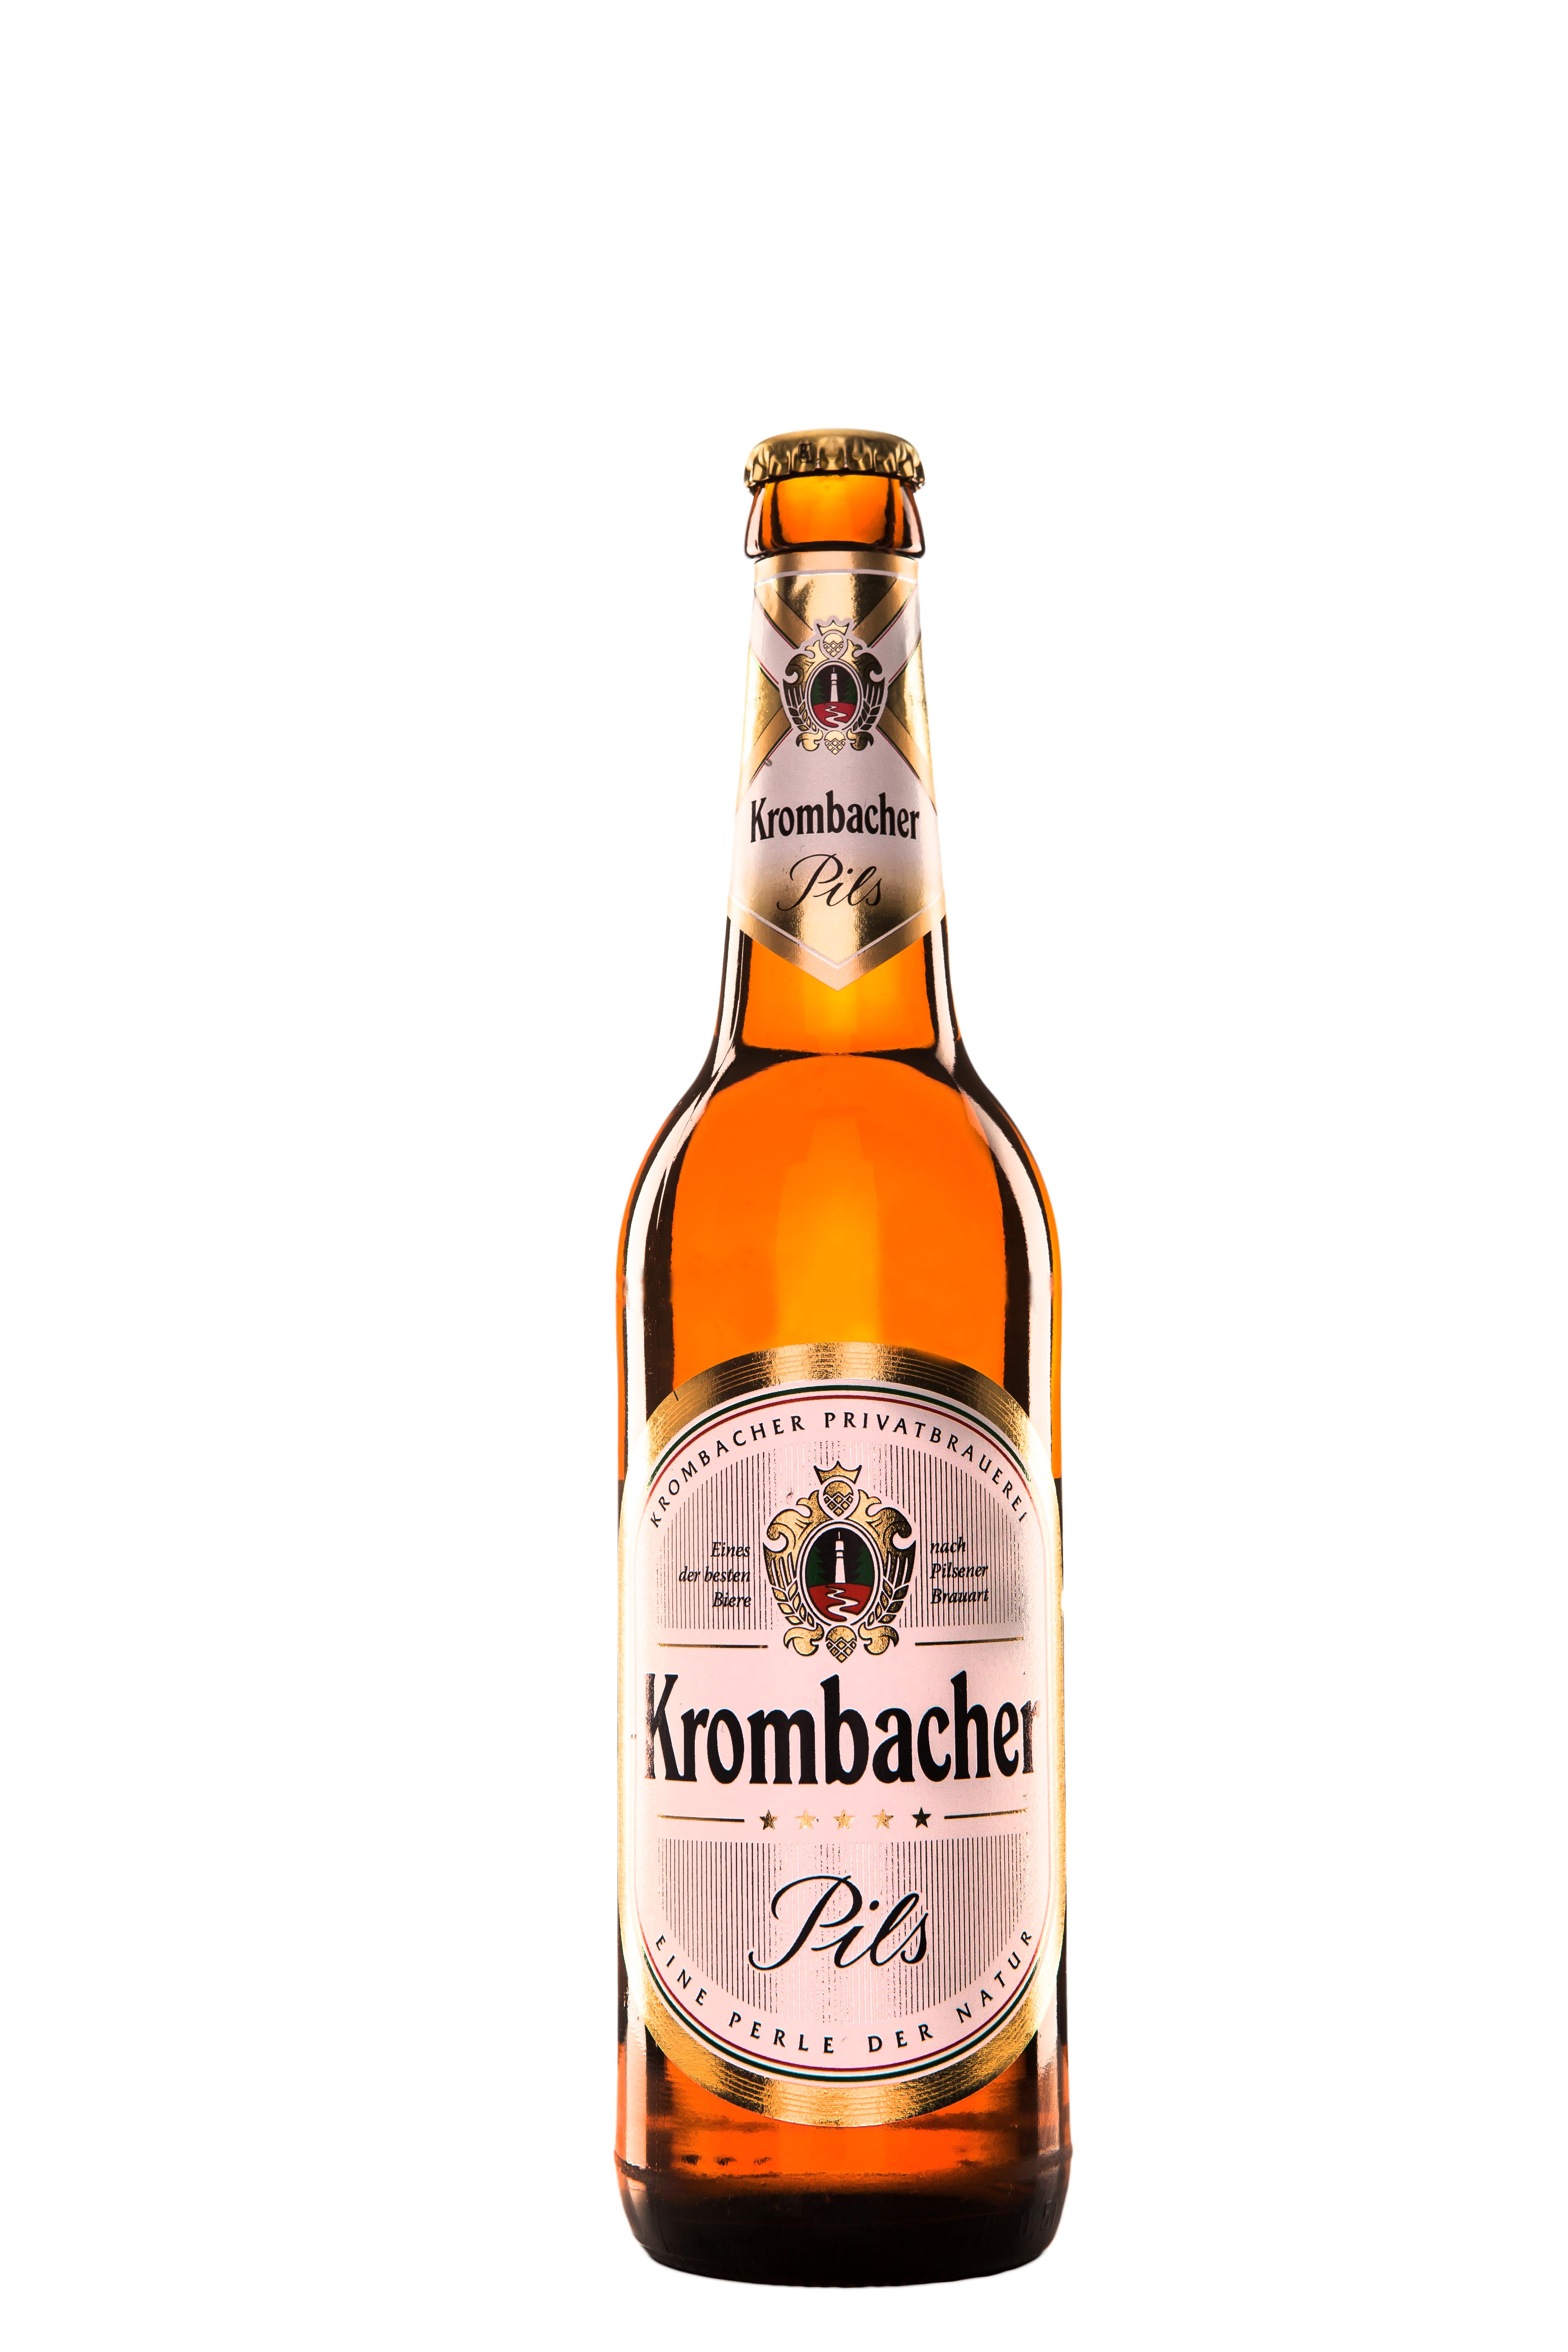 Krombacher Angebot Dortmund